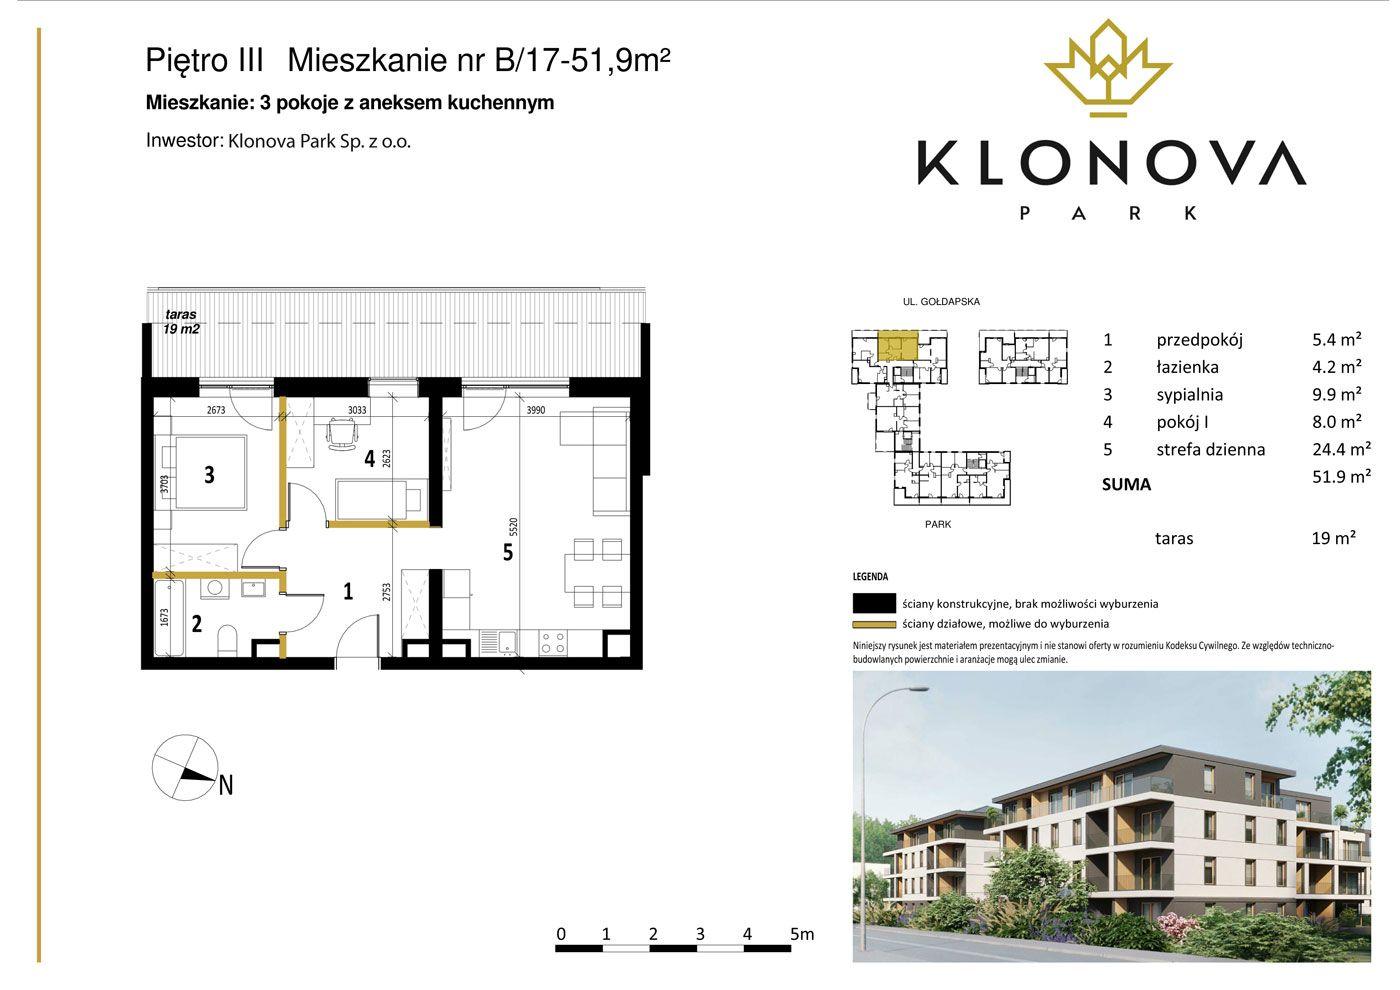 Apartamenty Klonova Park - Plan mieszkania B/17